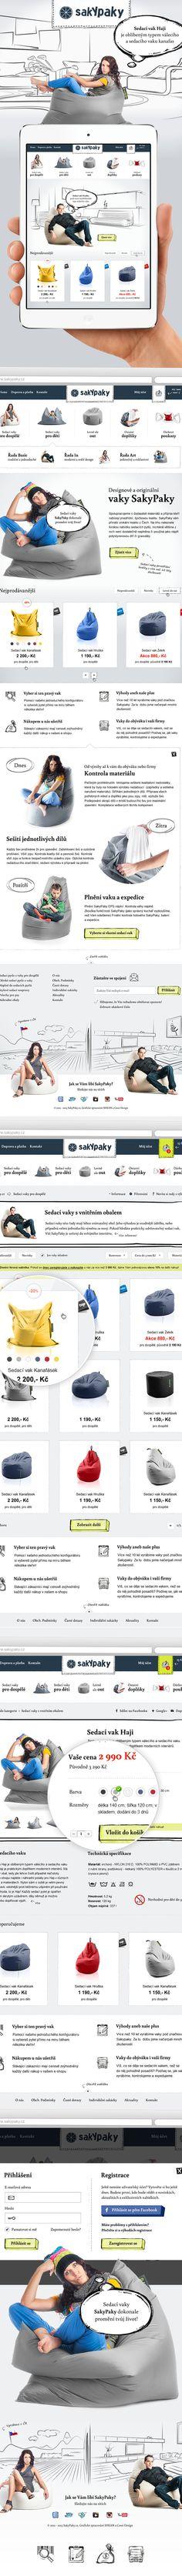 SakyPaky.cz - Sitting bags by Roman Káčerek, via Behance